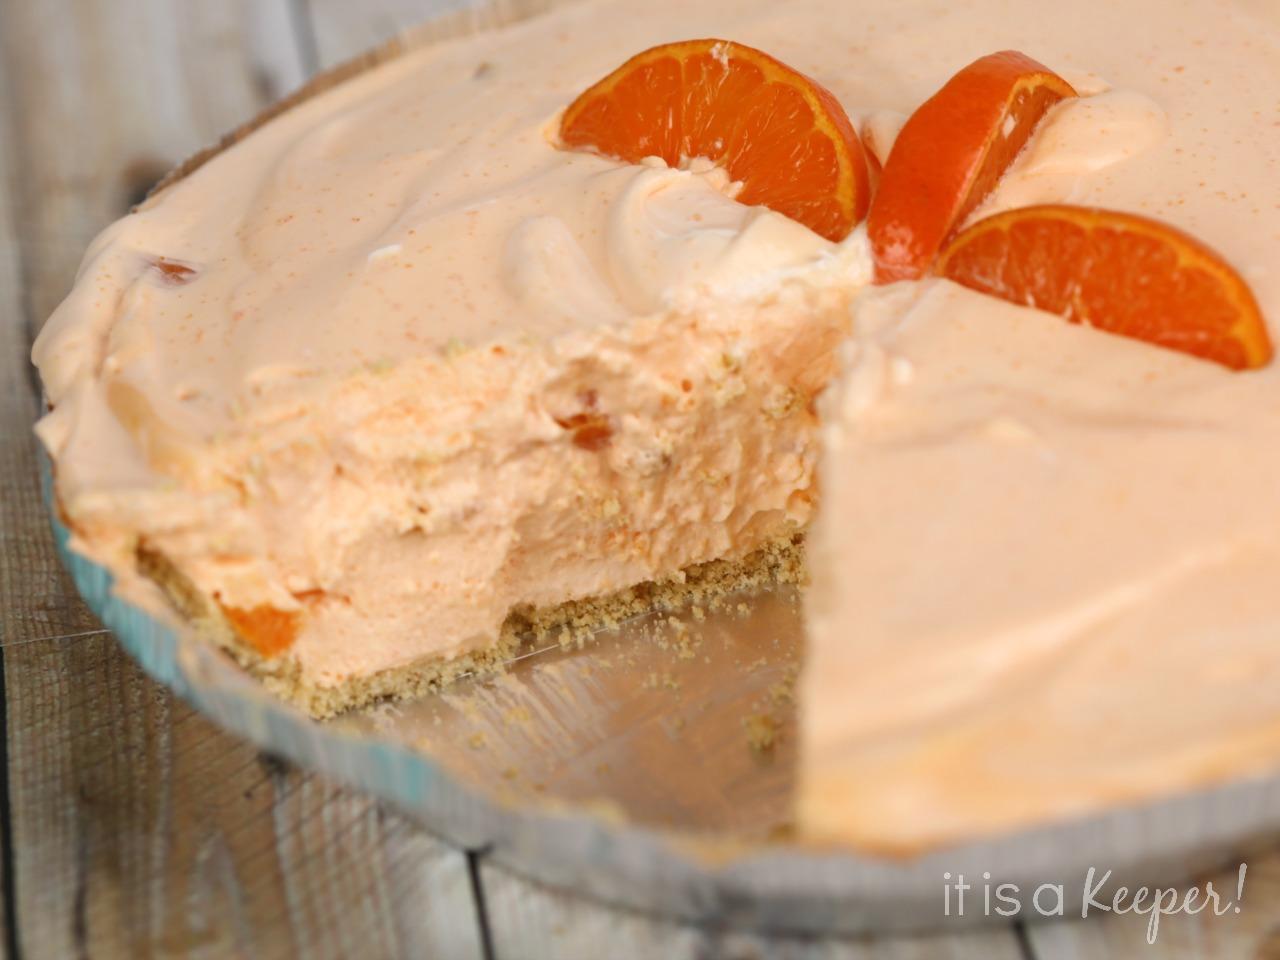 No Bake Mandarin Chiffon Pie - This easy no bake pie recipe is one of my favorite easy desserts